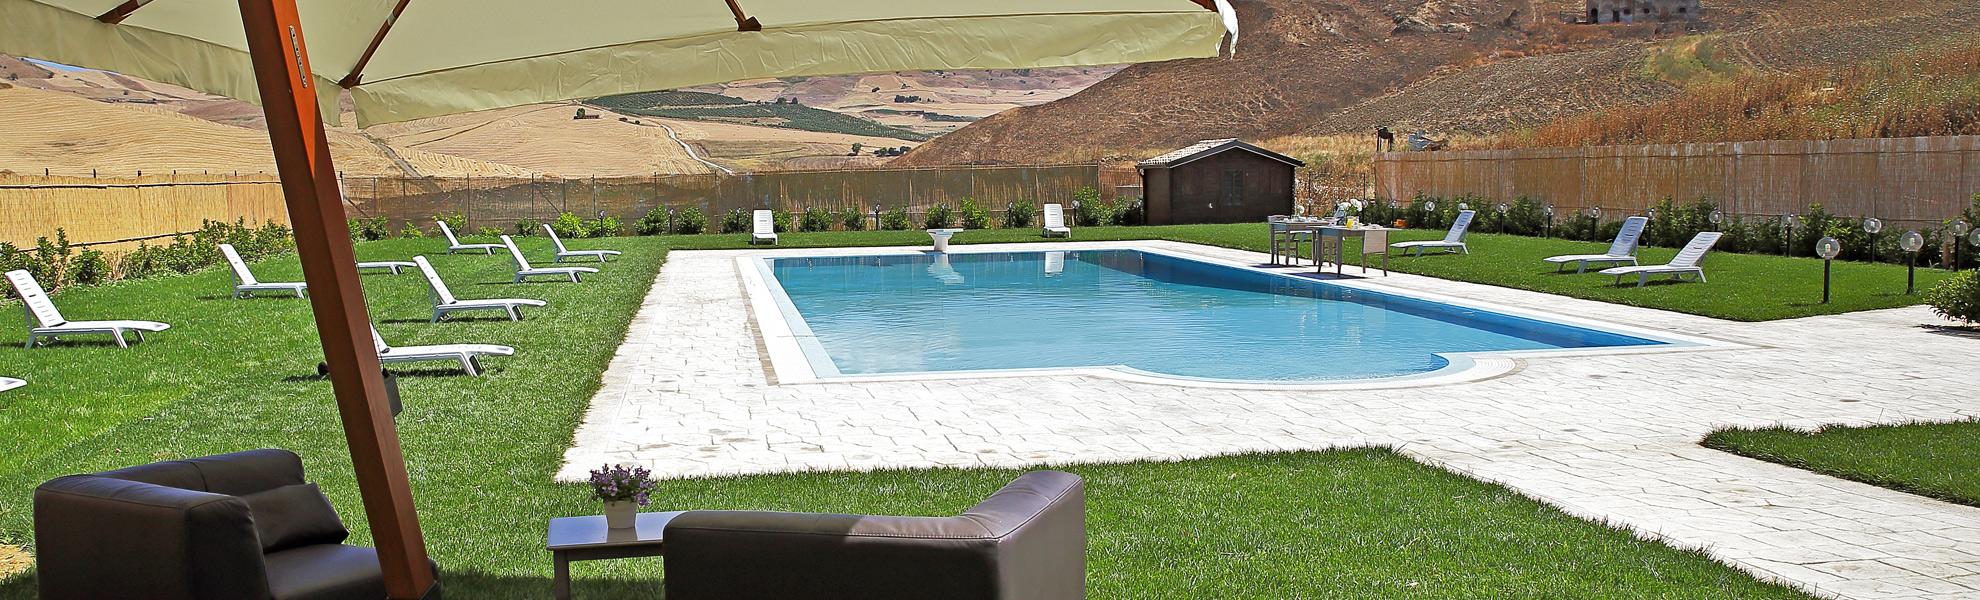 fontana-murata-resort-piscina